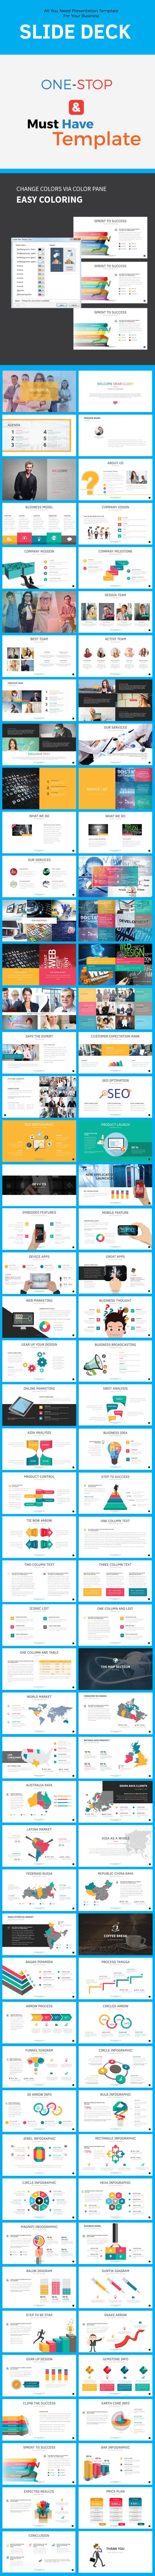 Startup Slide Deck - Pitch Deck PowerPoint Templates